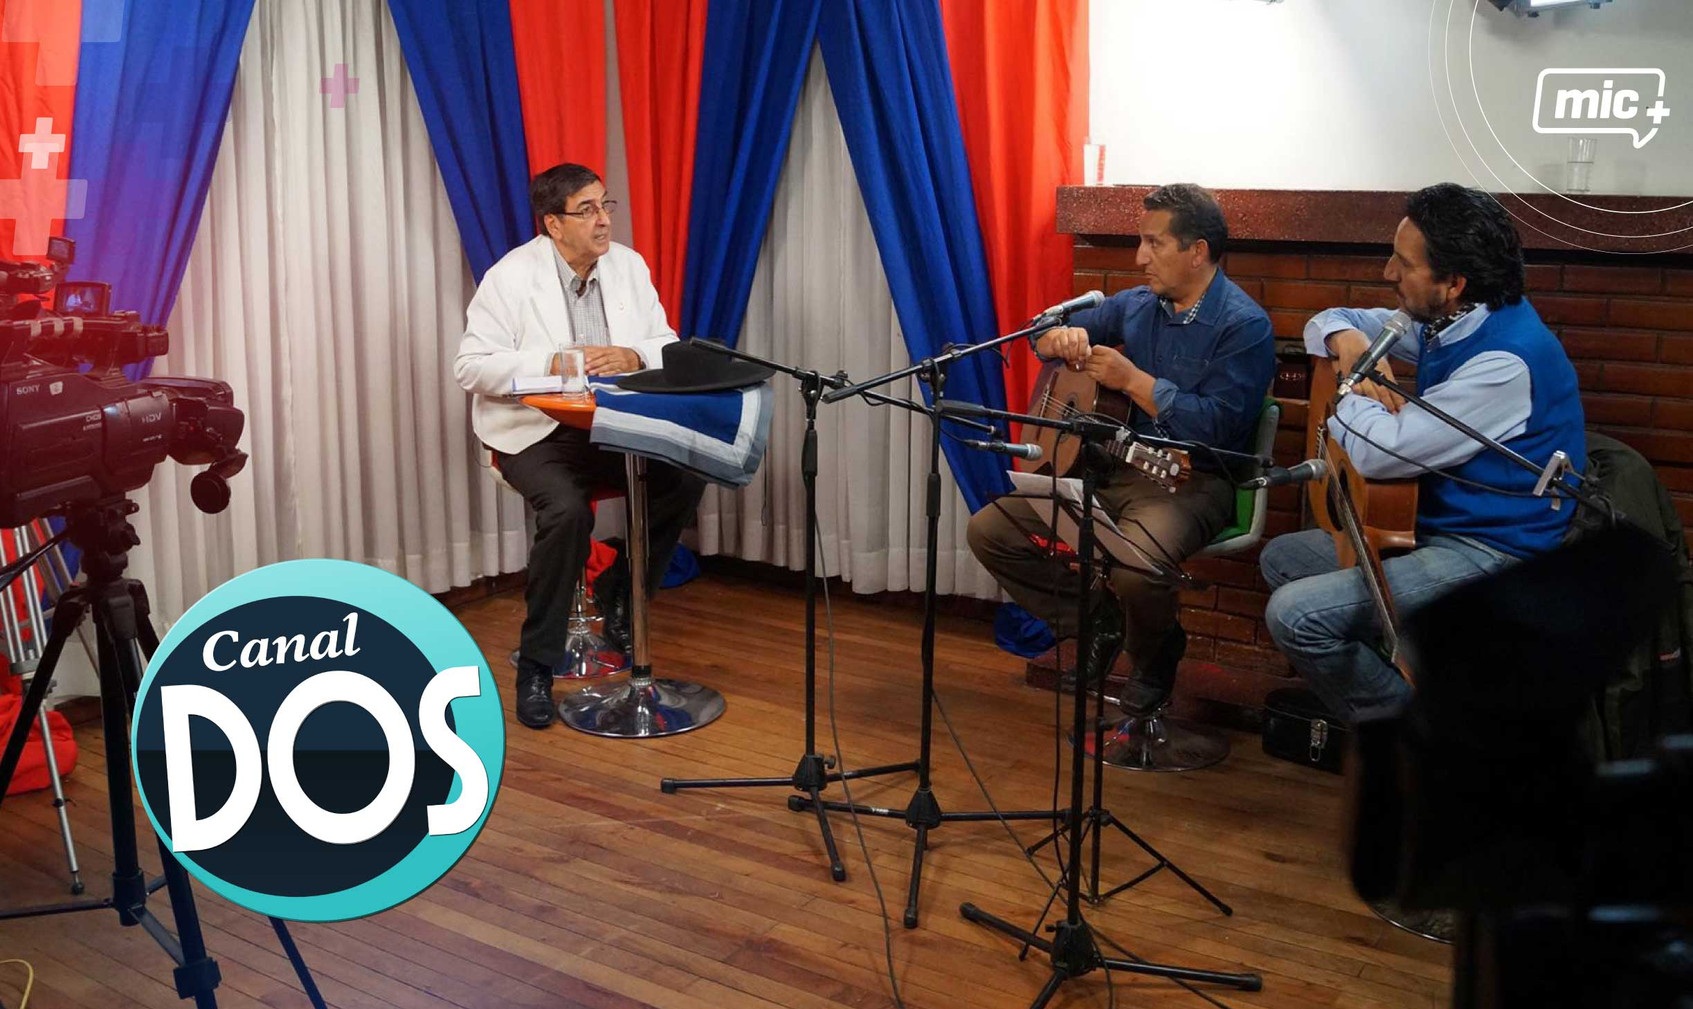 Canal-DOS-pag-internas-01.jpg